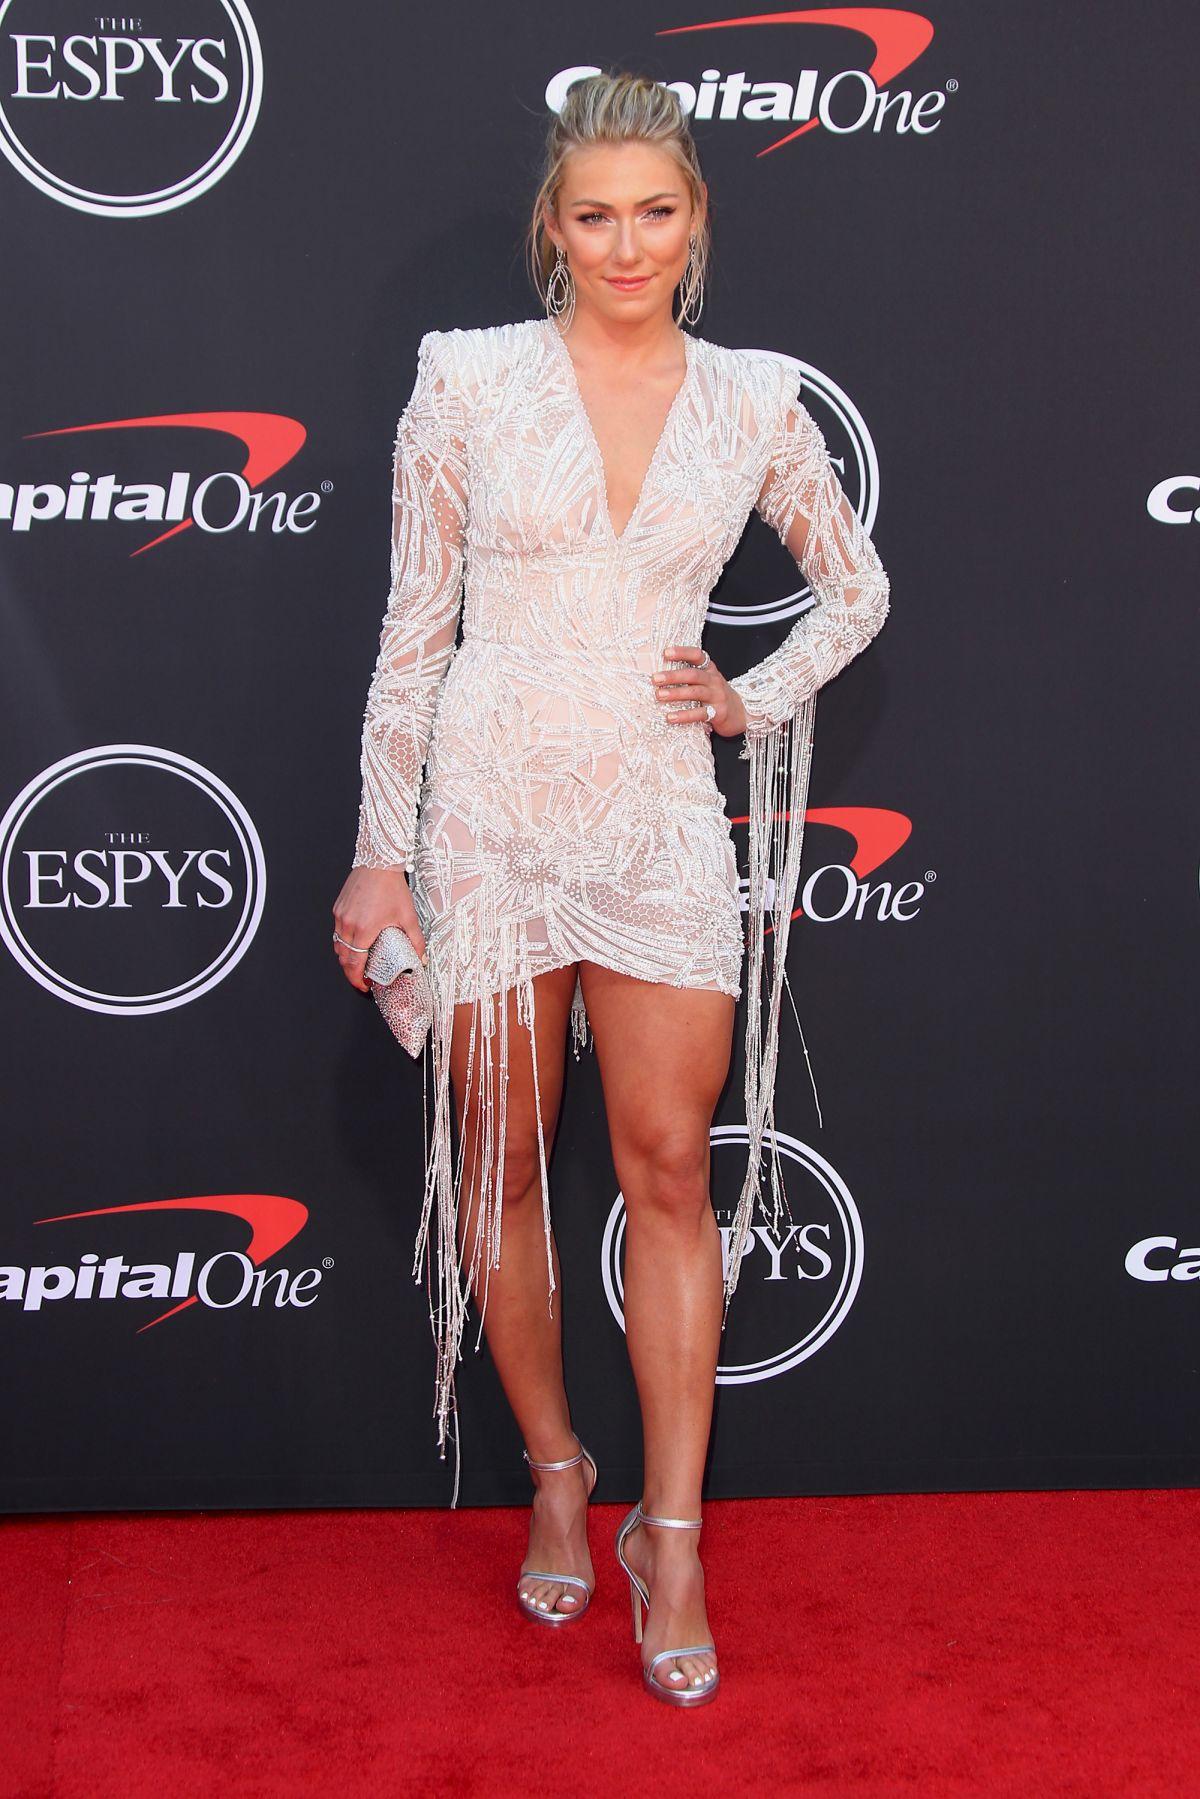 MIKAELA SHIFFRIN at 2019 ESPY Awards in Los Angeles 07/10/2019 - HawtCelebs